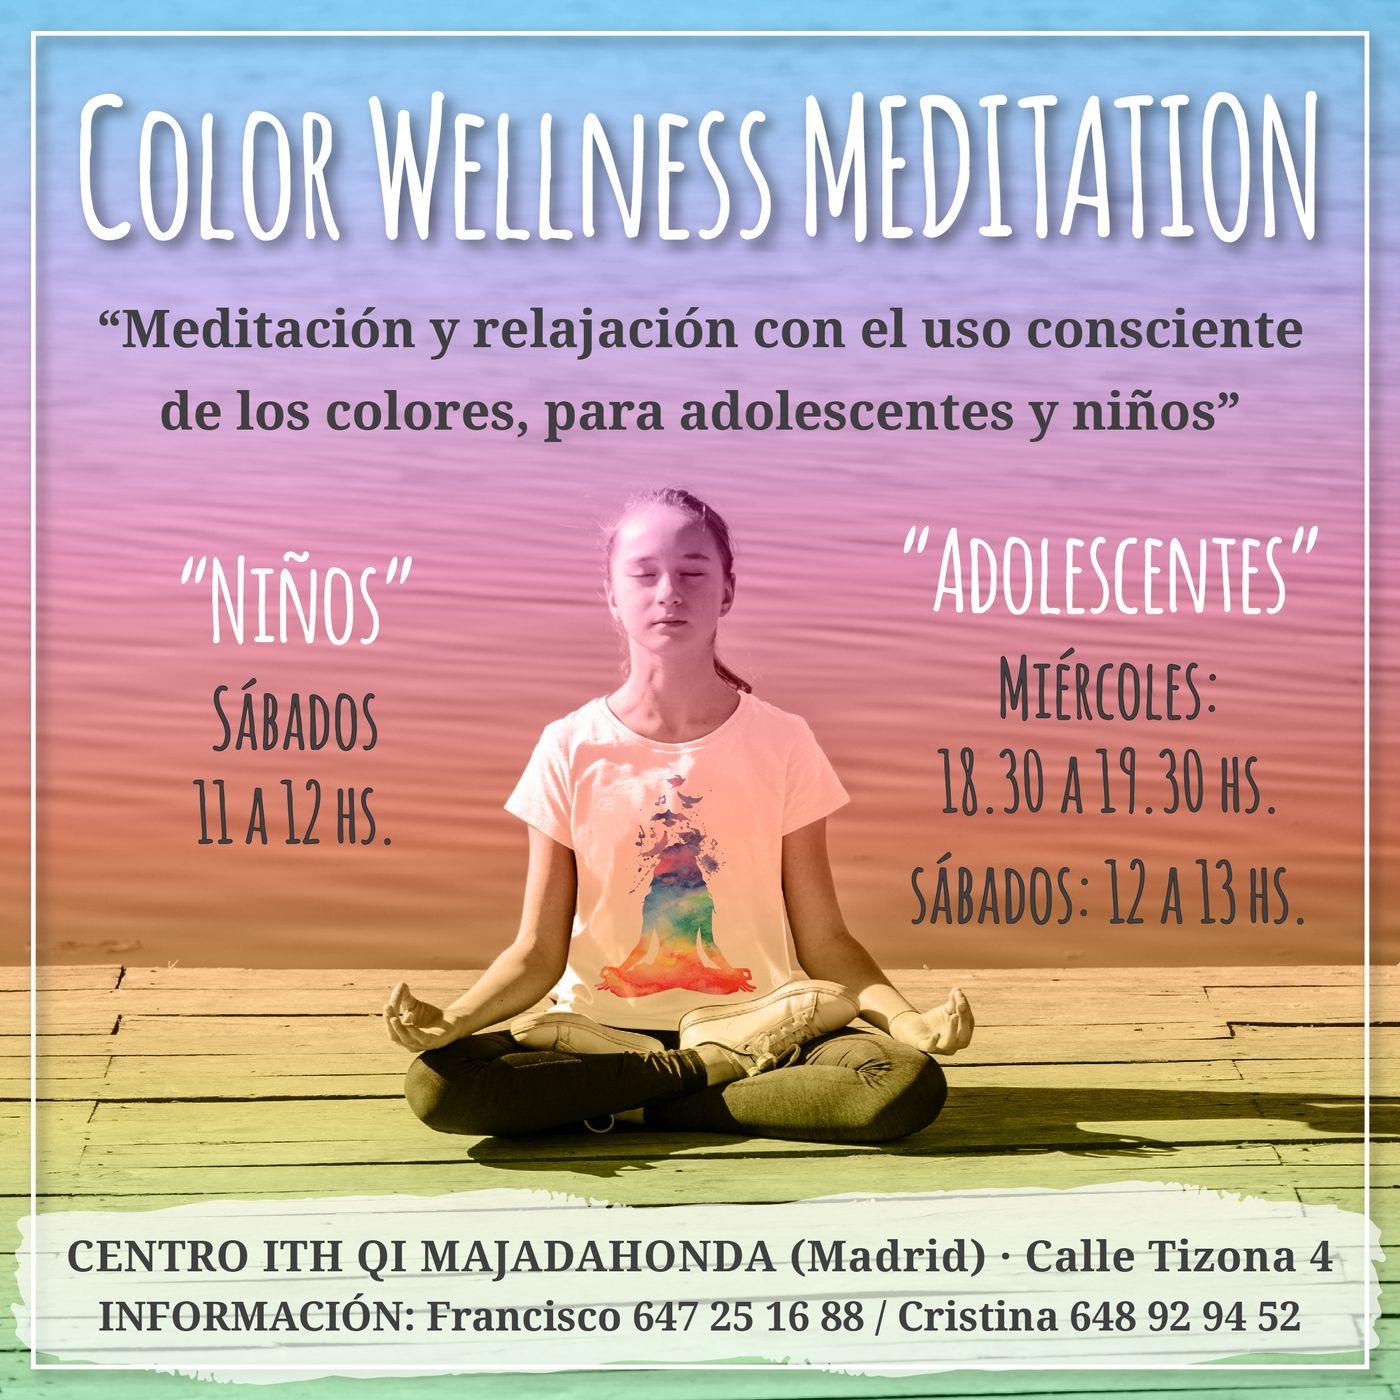 mindfulness gimnasia oriental pilates terapeutico Terapia Ocupacional, Psicología Clínica, terapias holísticas, osteopatía, psicología clínica, fisioterapia, Instituto de Técnicas Holísticas en Majadahonda